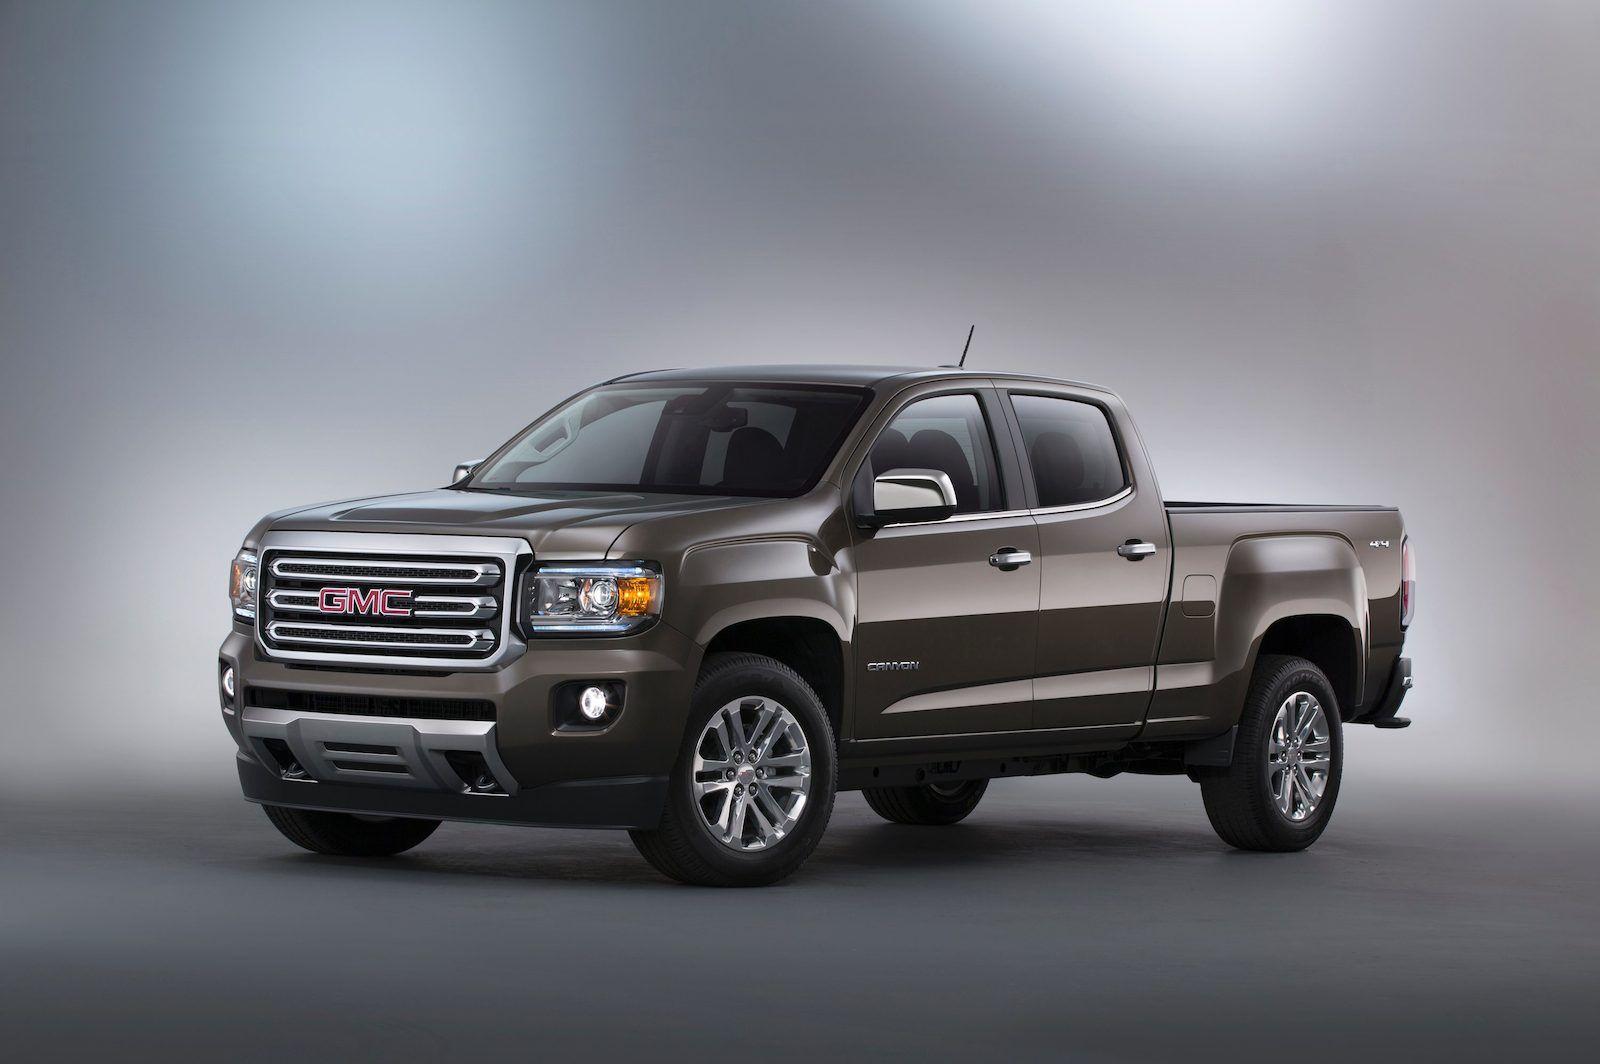 sierra truck vehicle pa performance gmc details erie trucks photo package sca